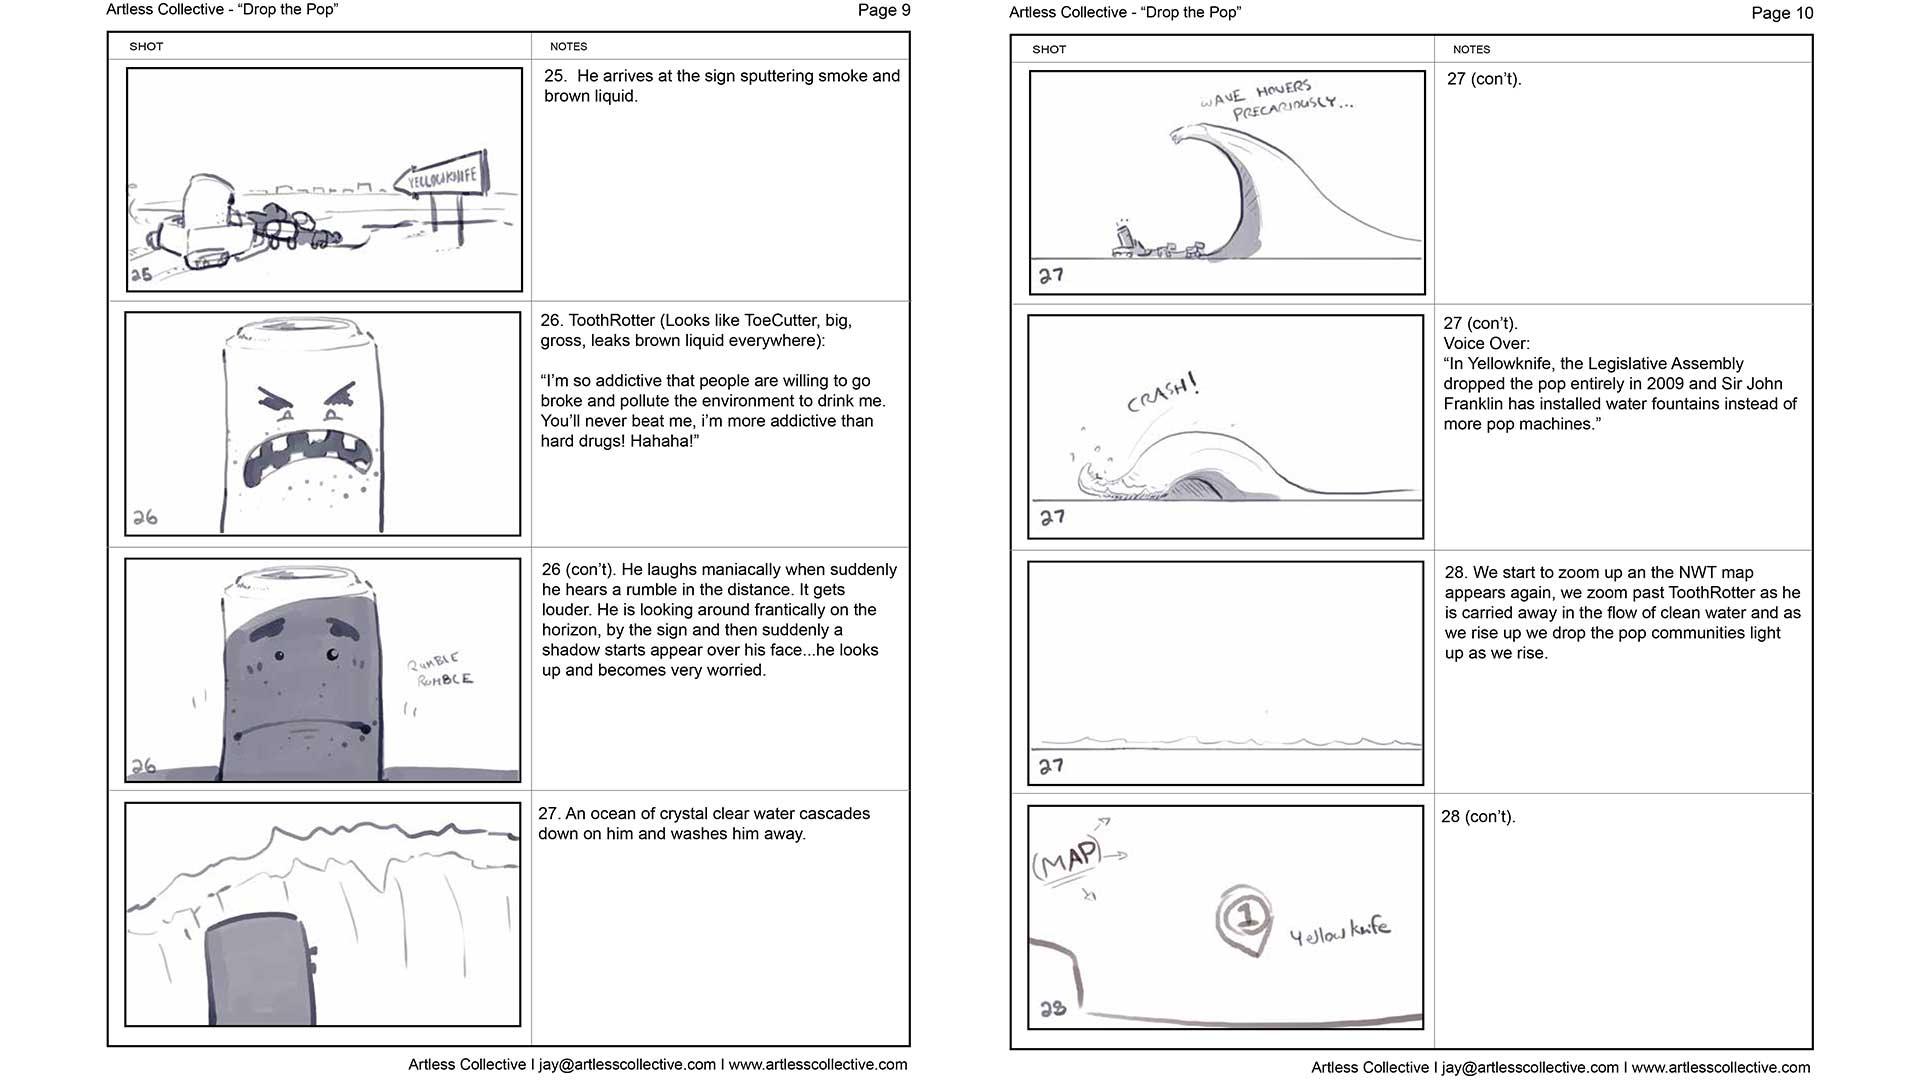 DtP-Storyboard_05